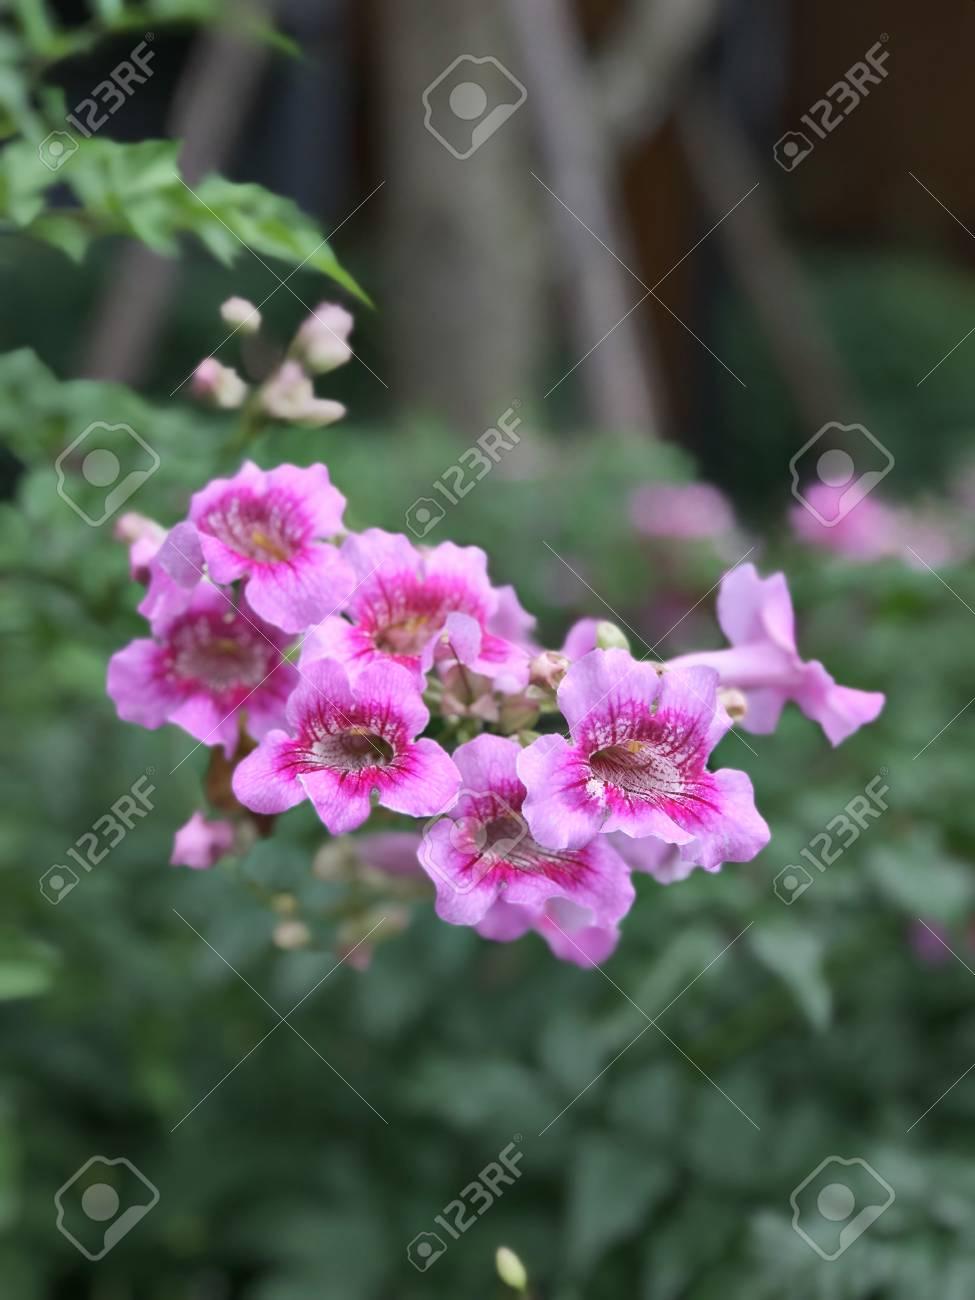 Pink Trumpet Vine Or Port Sthns Creeper Or Podranea Ricasoliana